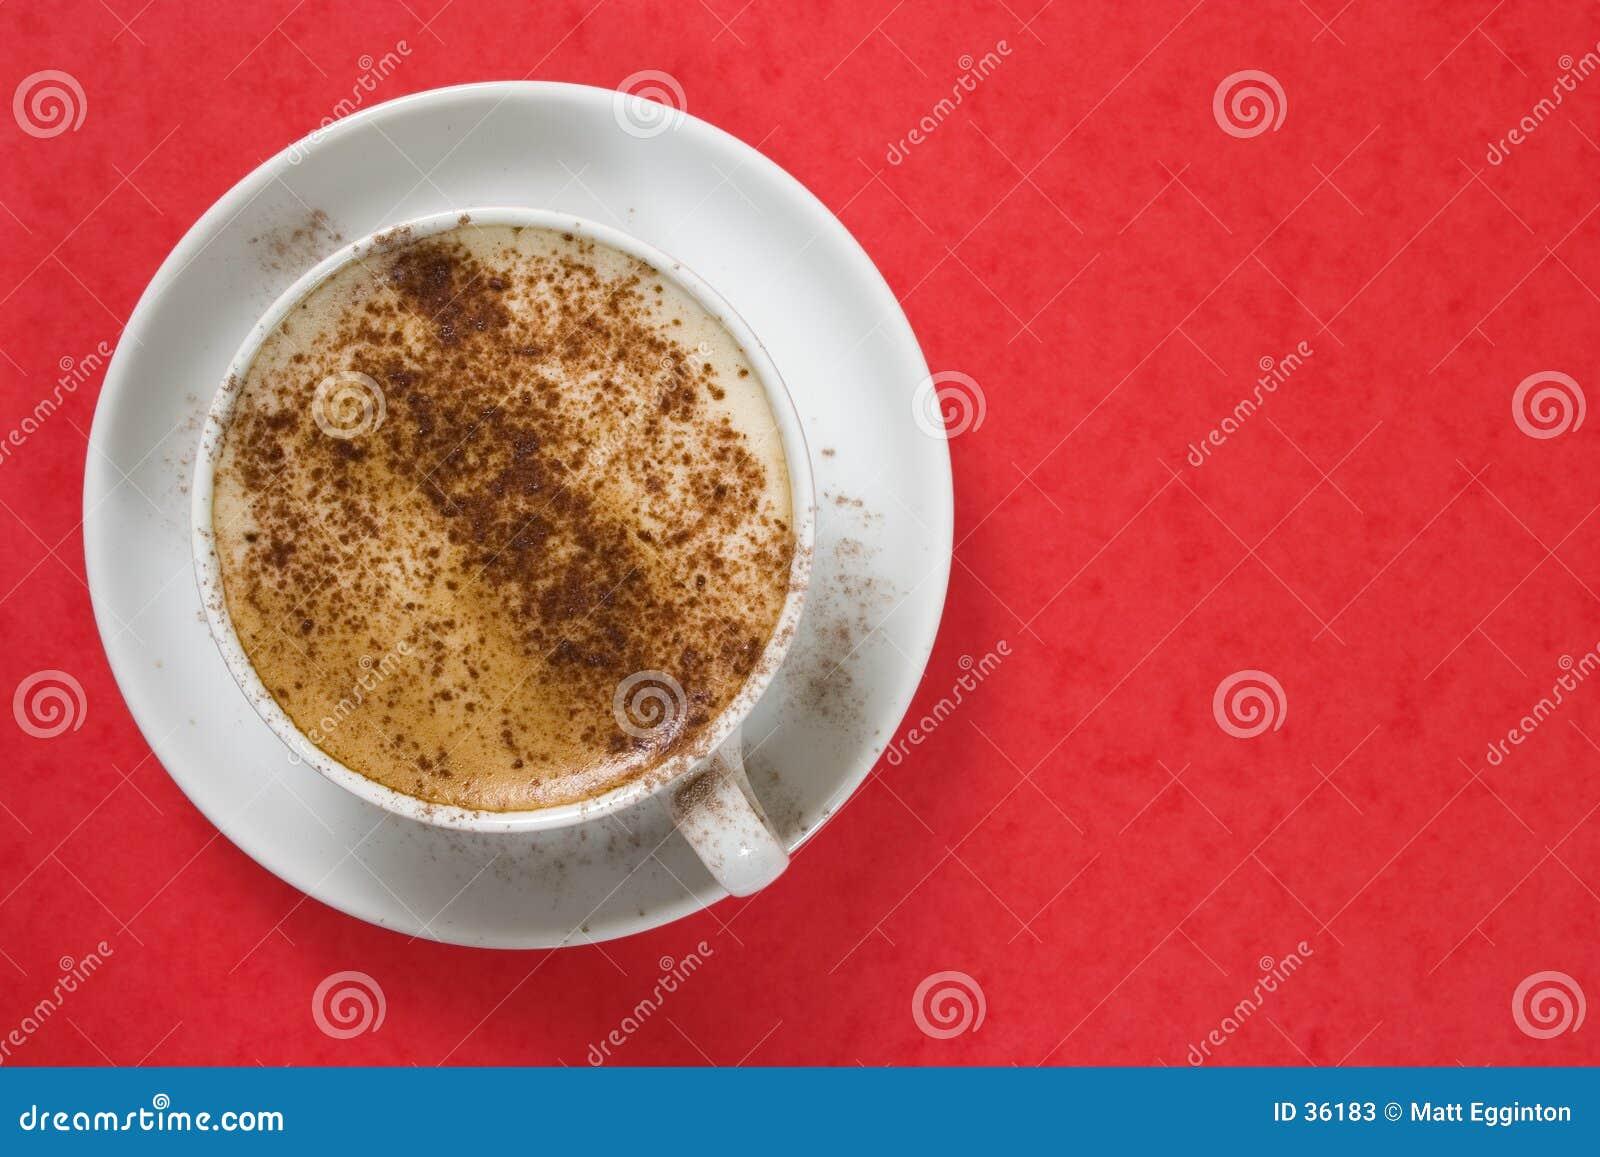 Download Cappuchno en rojo imagen de archivo. Imagen de azúcar, café - 36183